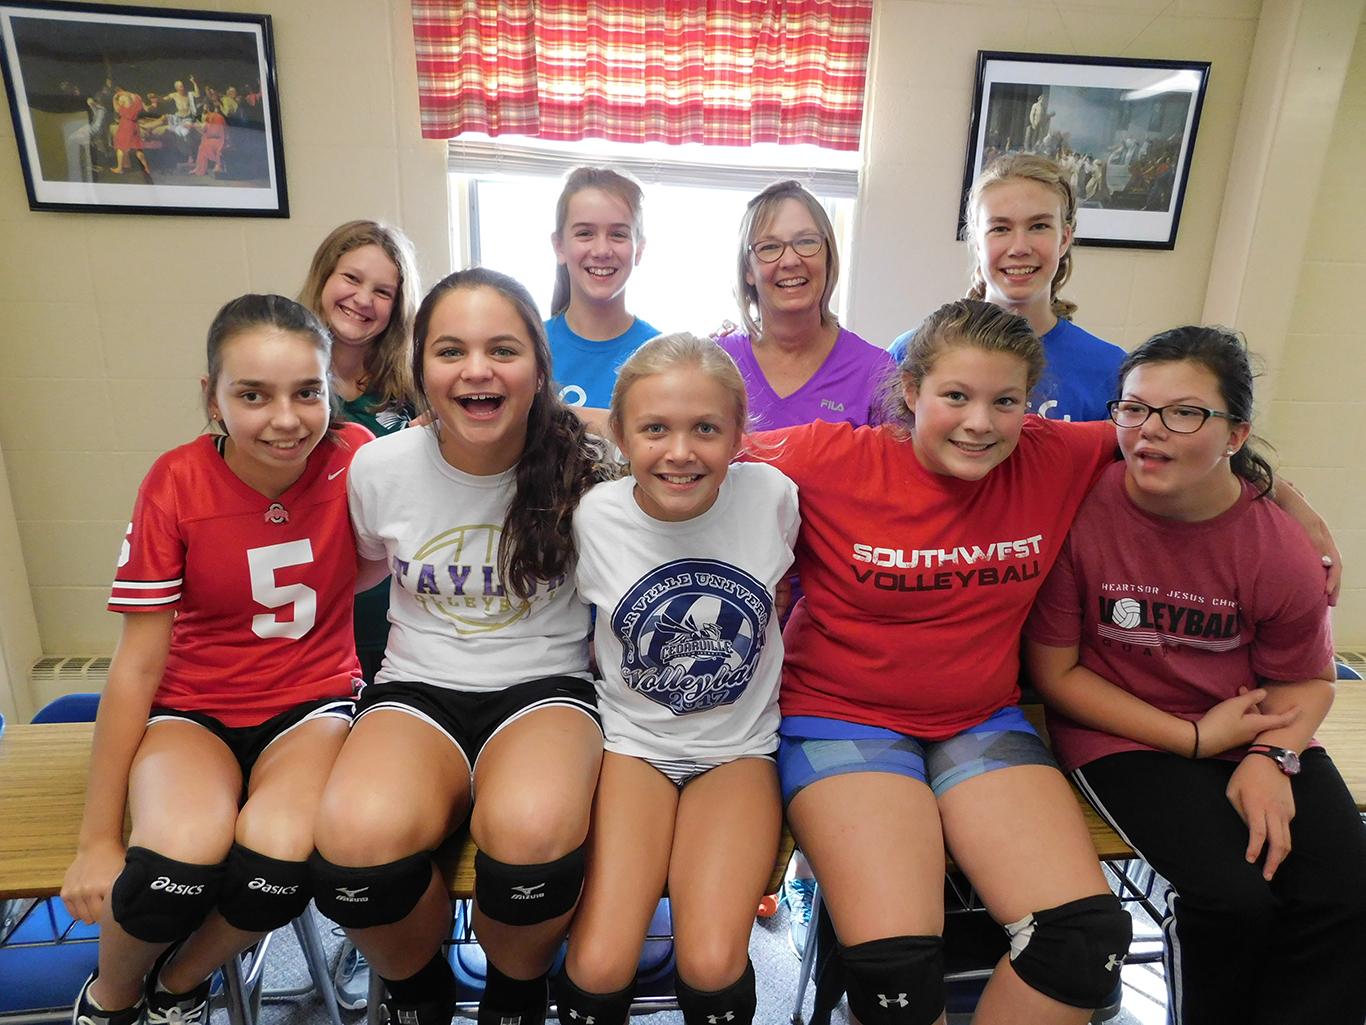 7th/8th Grade Volleyball Team